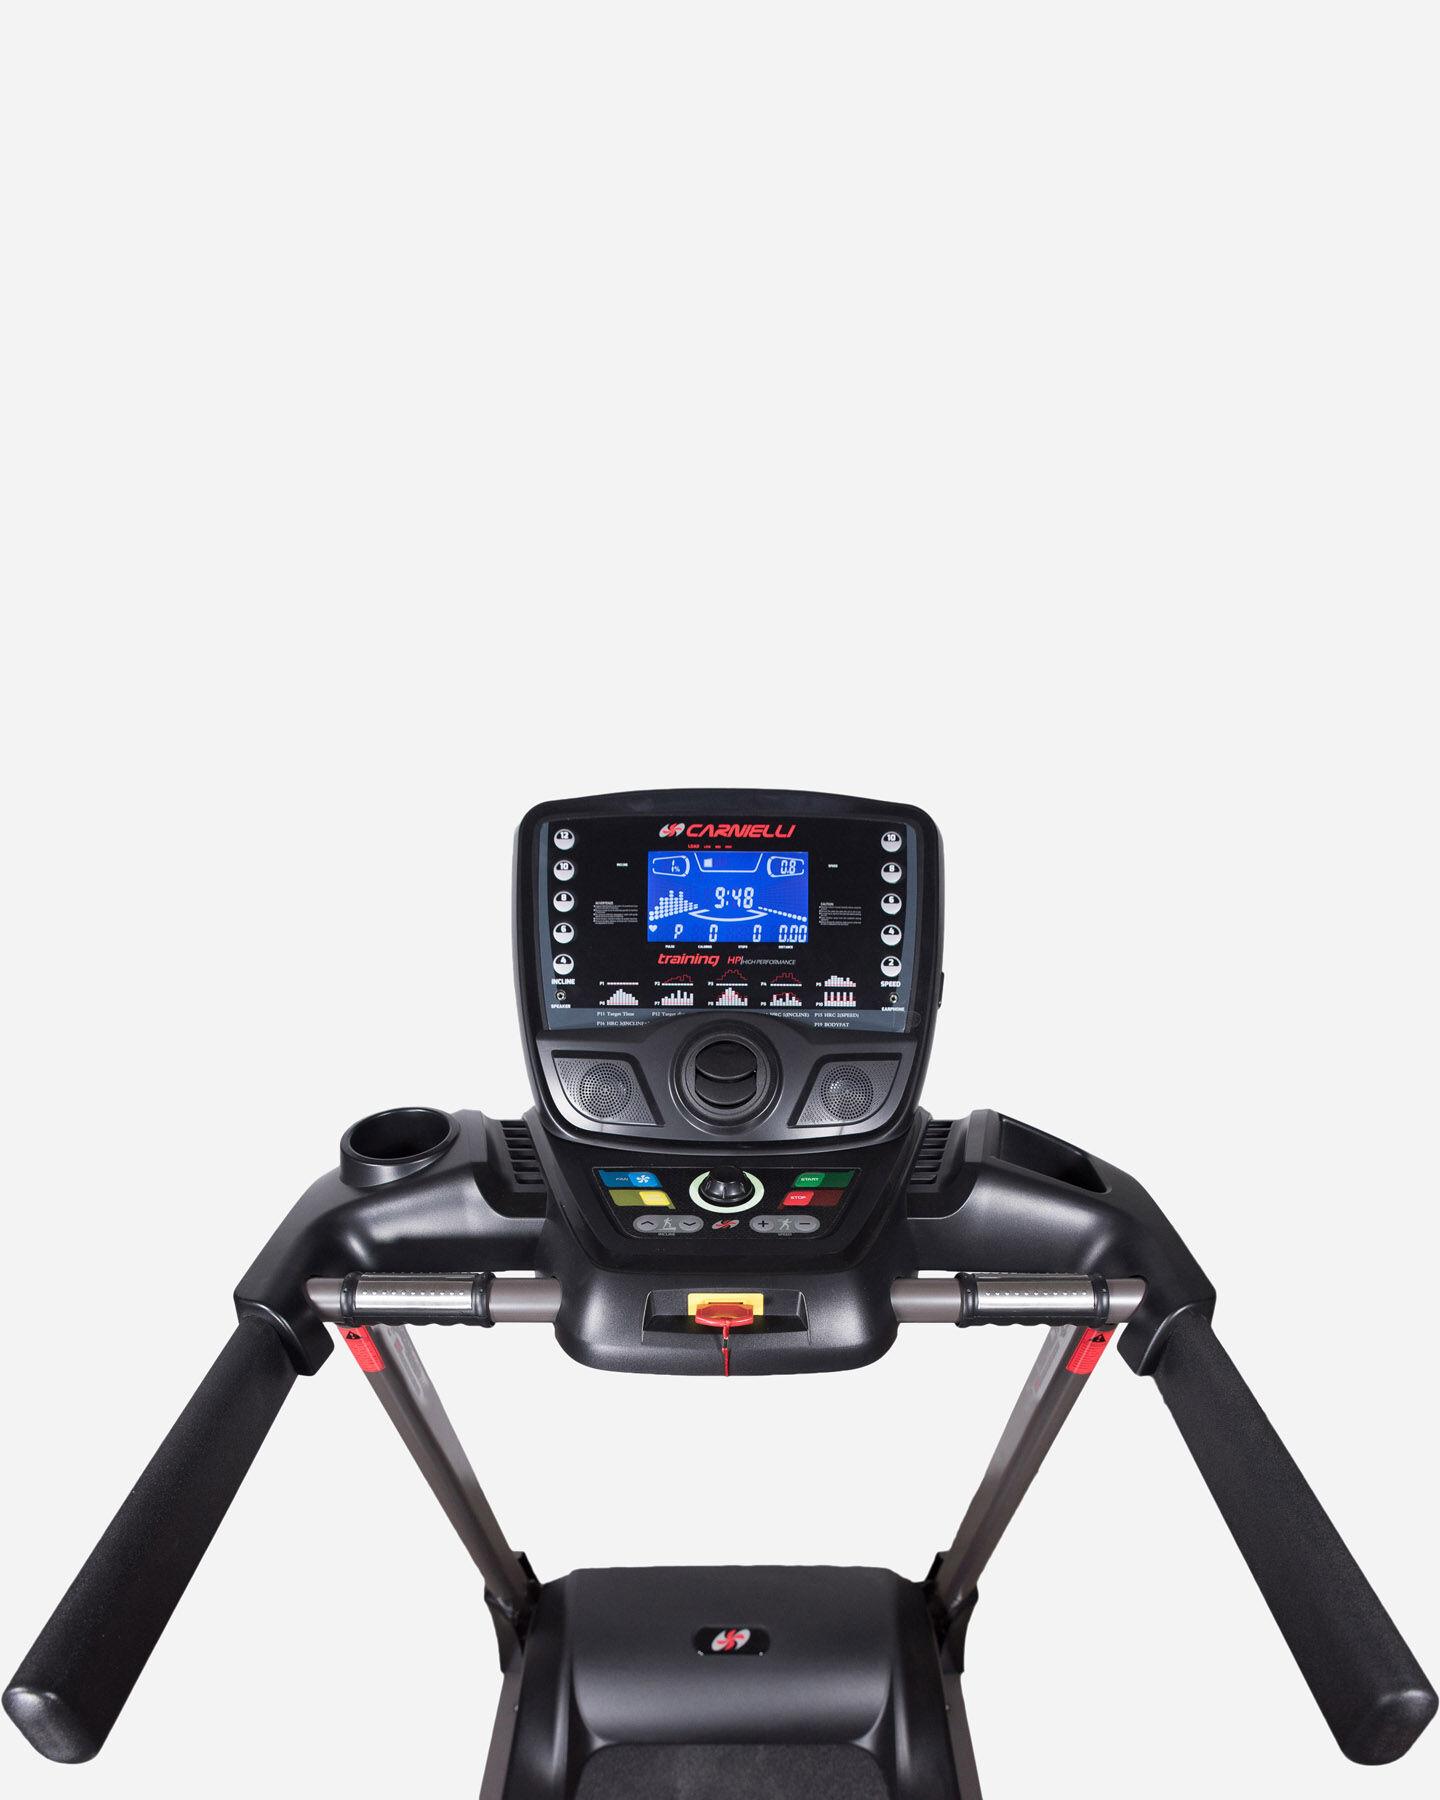 Tapis roulant CARNIELLI HP TRAINING S4007088|GEN|UNI scatto 2